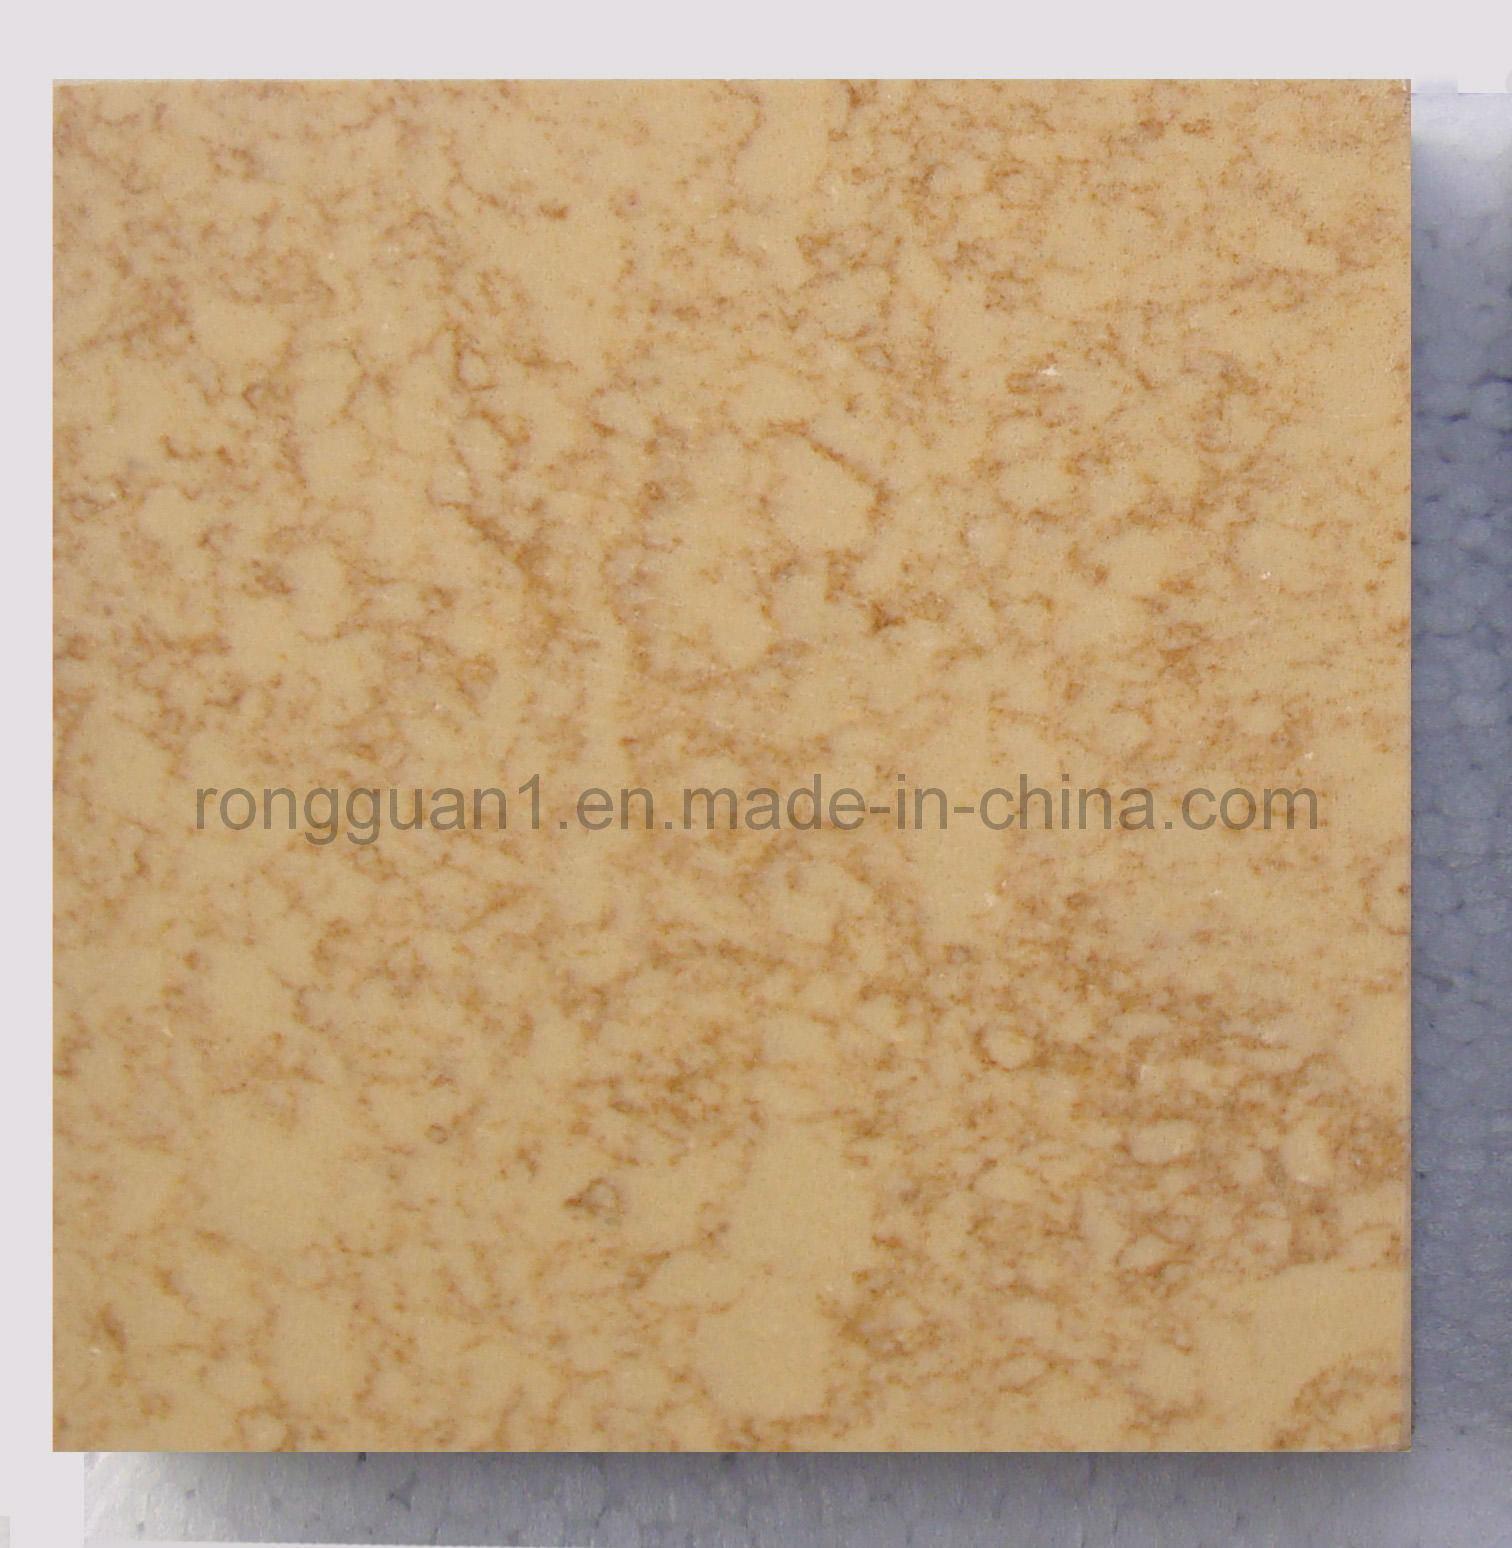 Stone Floor Tile & Wall Tile, Made of Artificial Quartz Stone